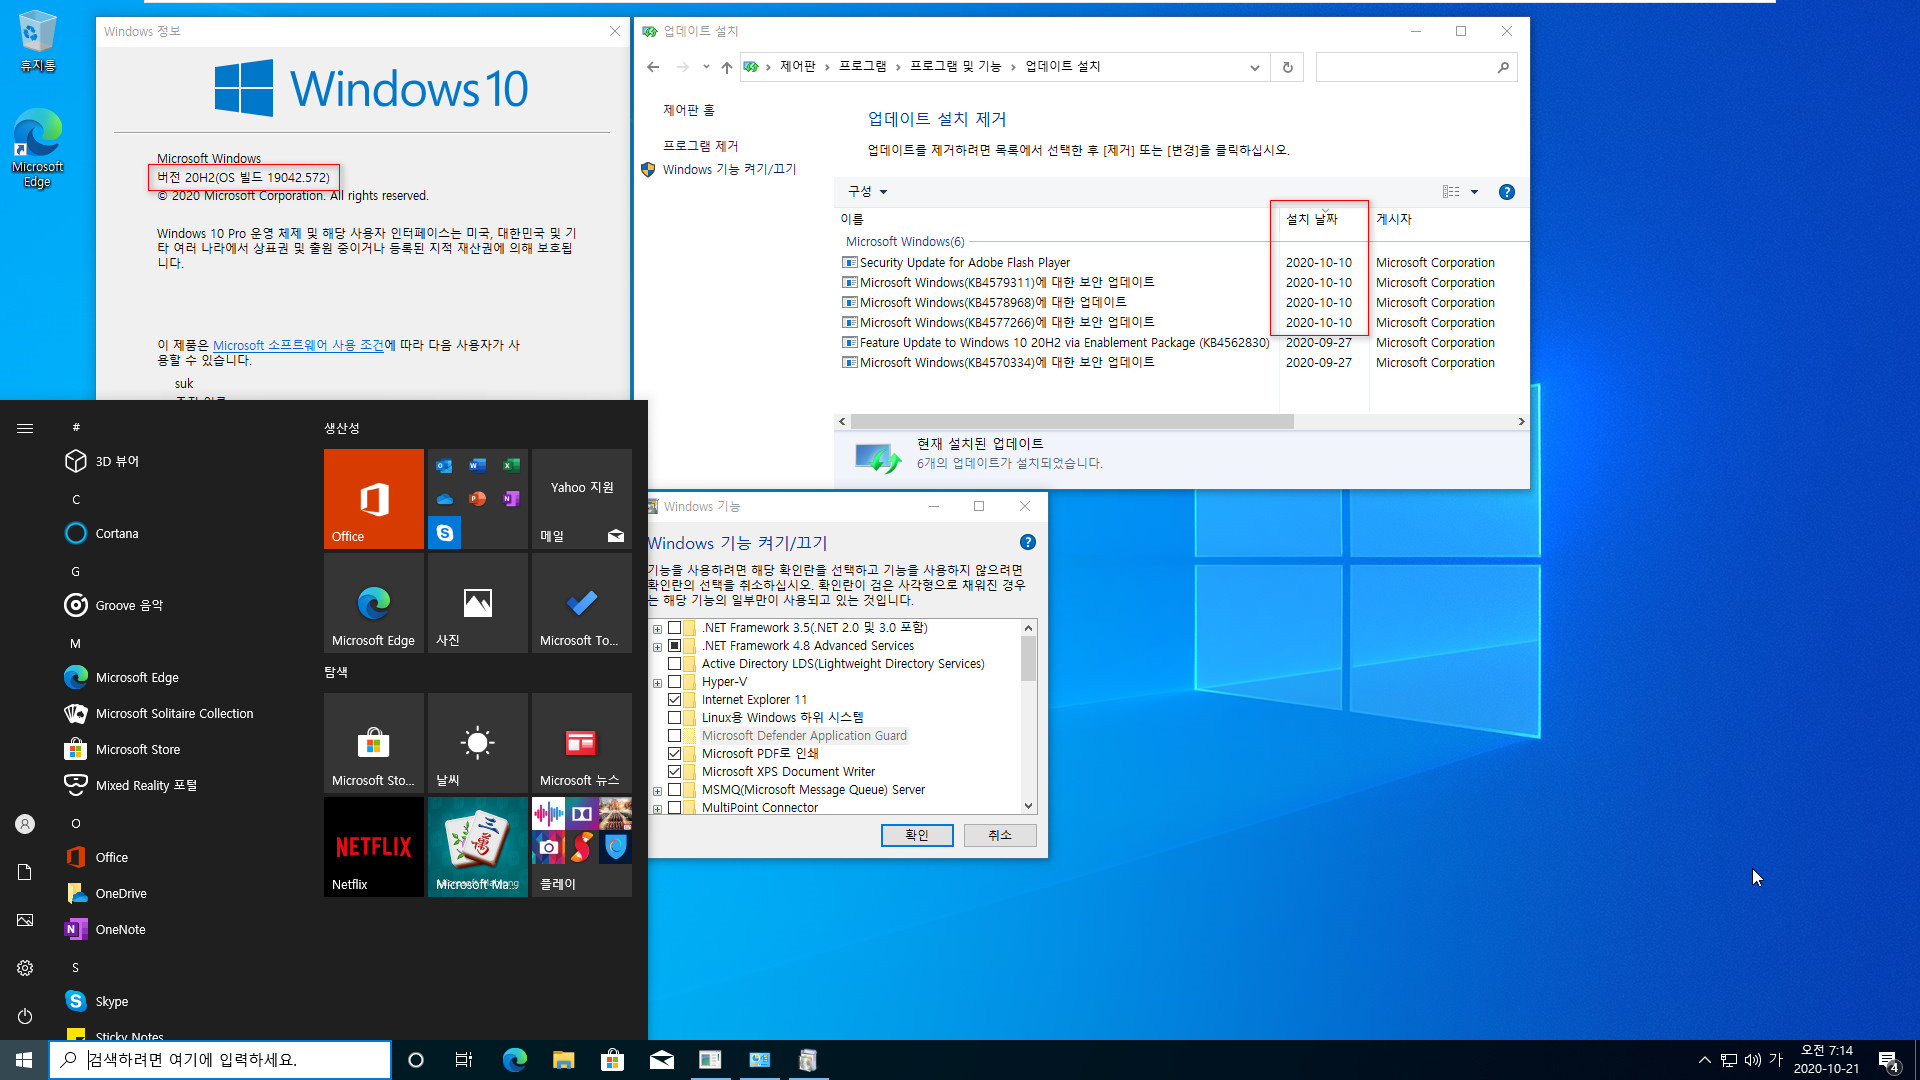 Windows 10 버전 2009 (20H2) 정식 출시되었네요 - MSDN은 19042.508 빌드 9월 정기 업데이트인데, ms 홈페이지는 19042.572 빌드 10월 정기 업데이트네요 - 다운로드하고 윈도우 설치하여 확인해봅니다 2020-10-21_071418.jpg